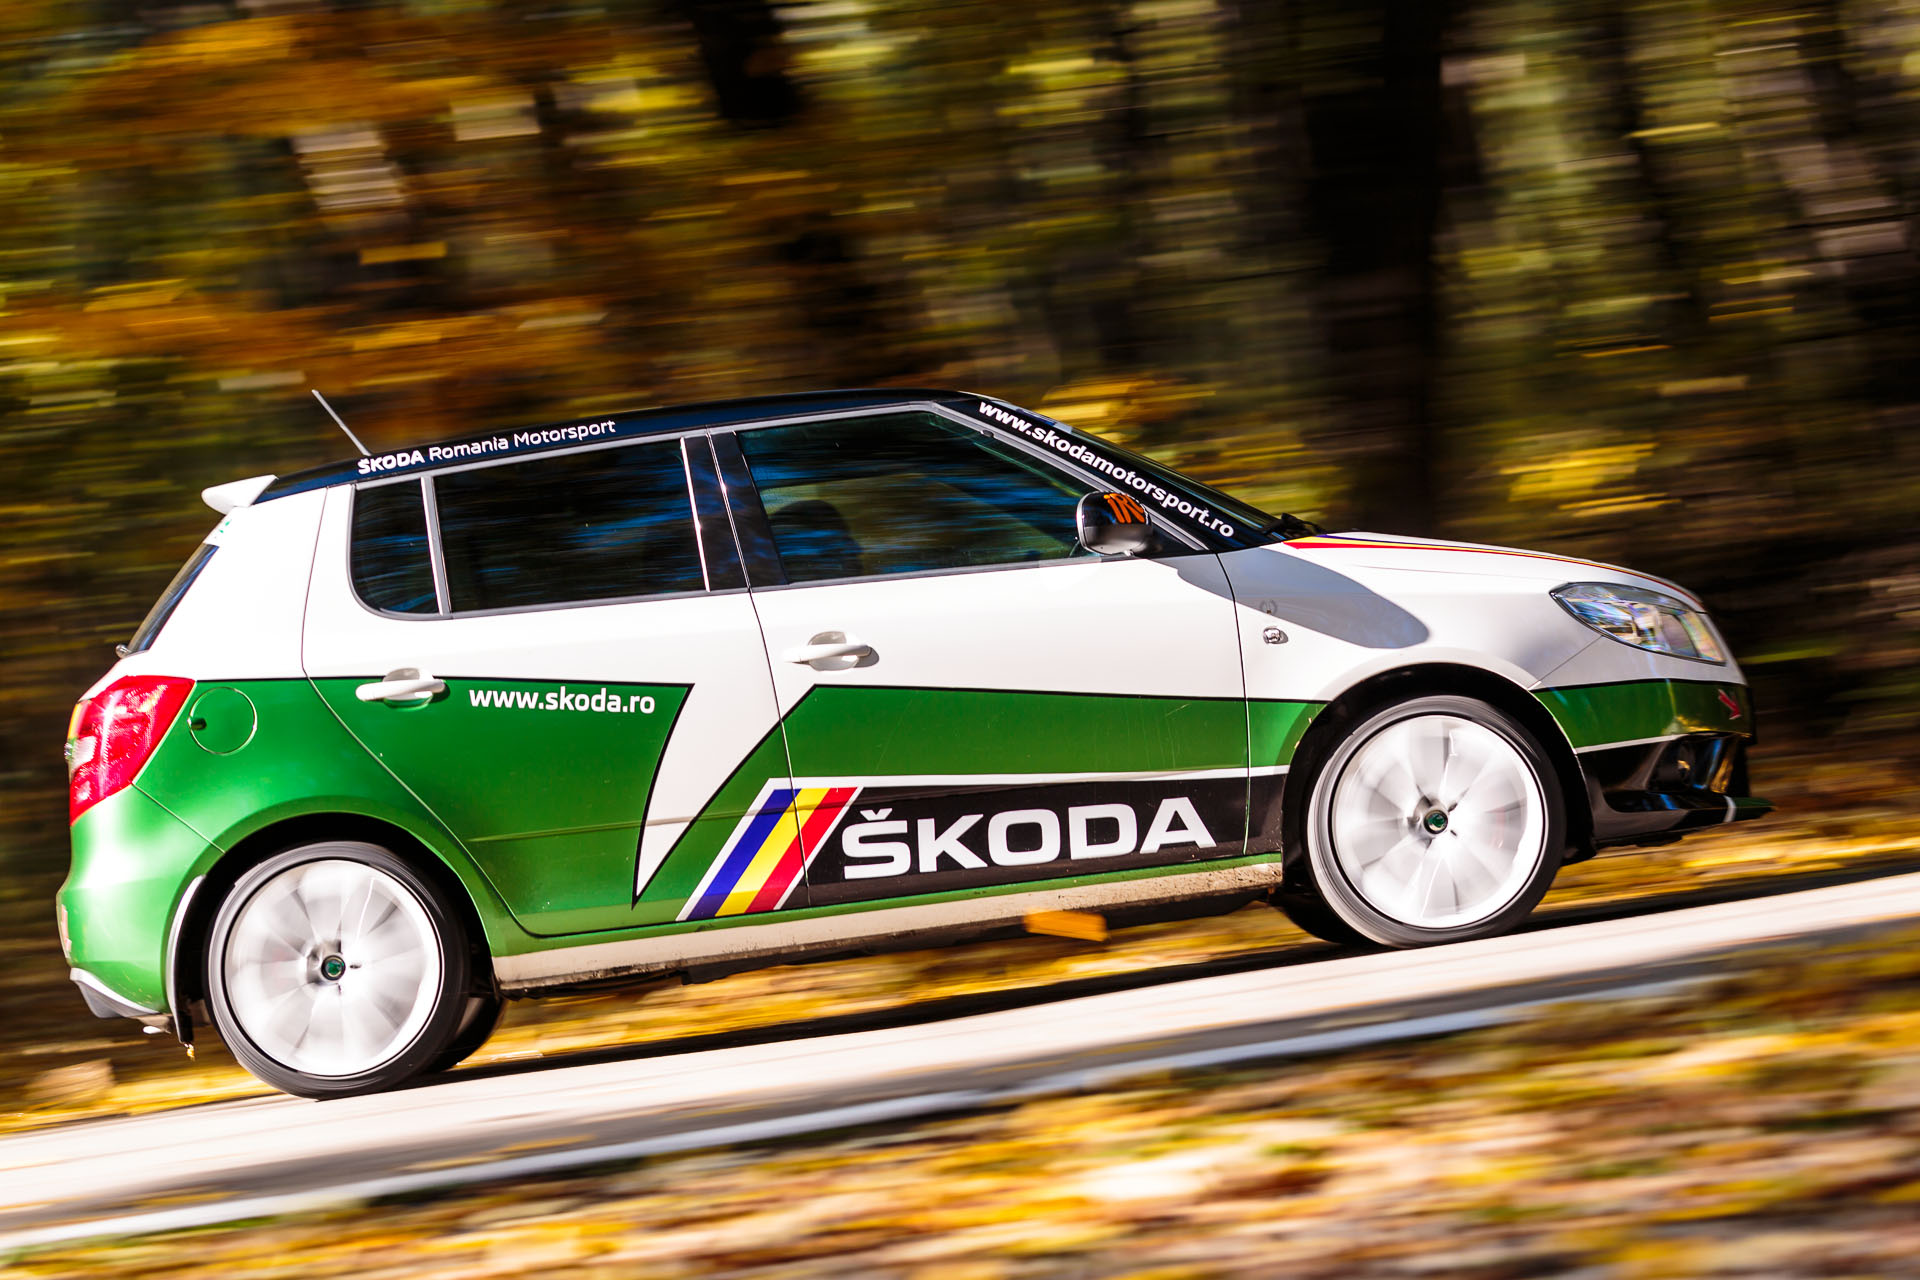 Drive test Skoda Fabia RS – 1.4 TSI 180 cp – DSG